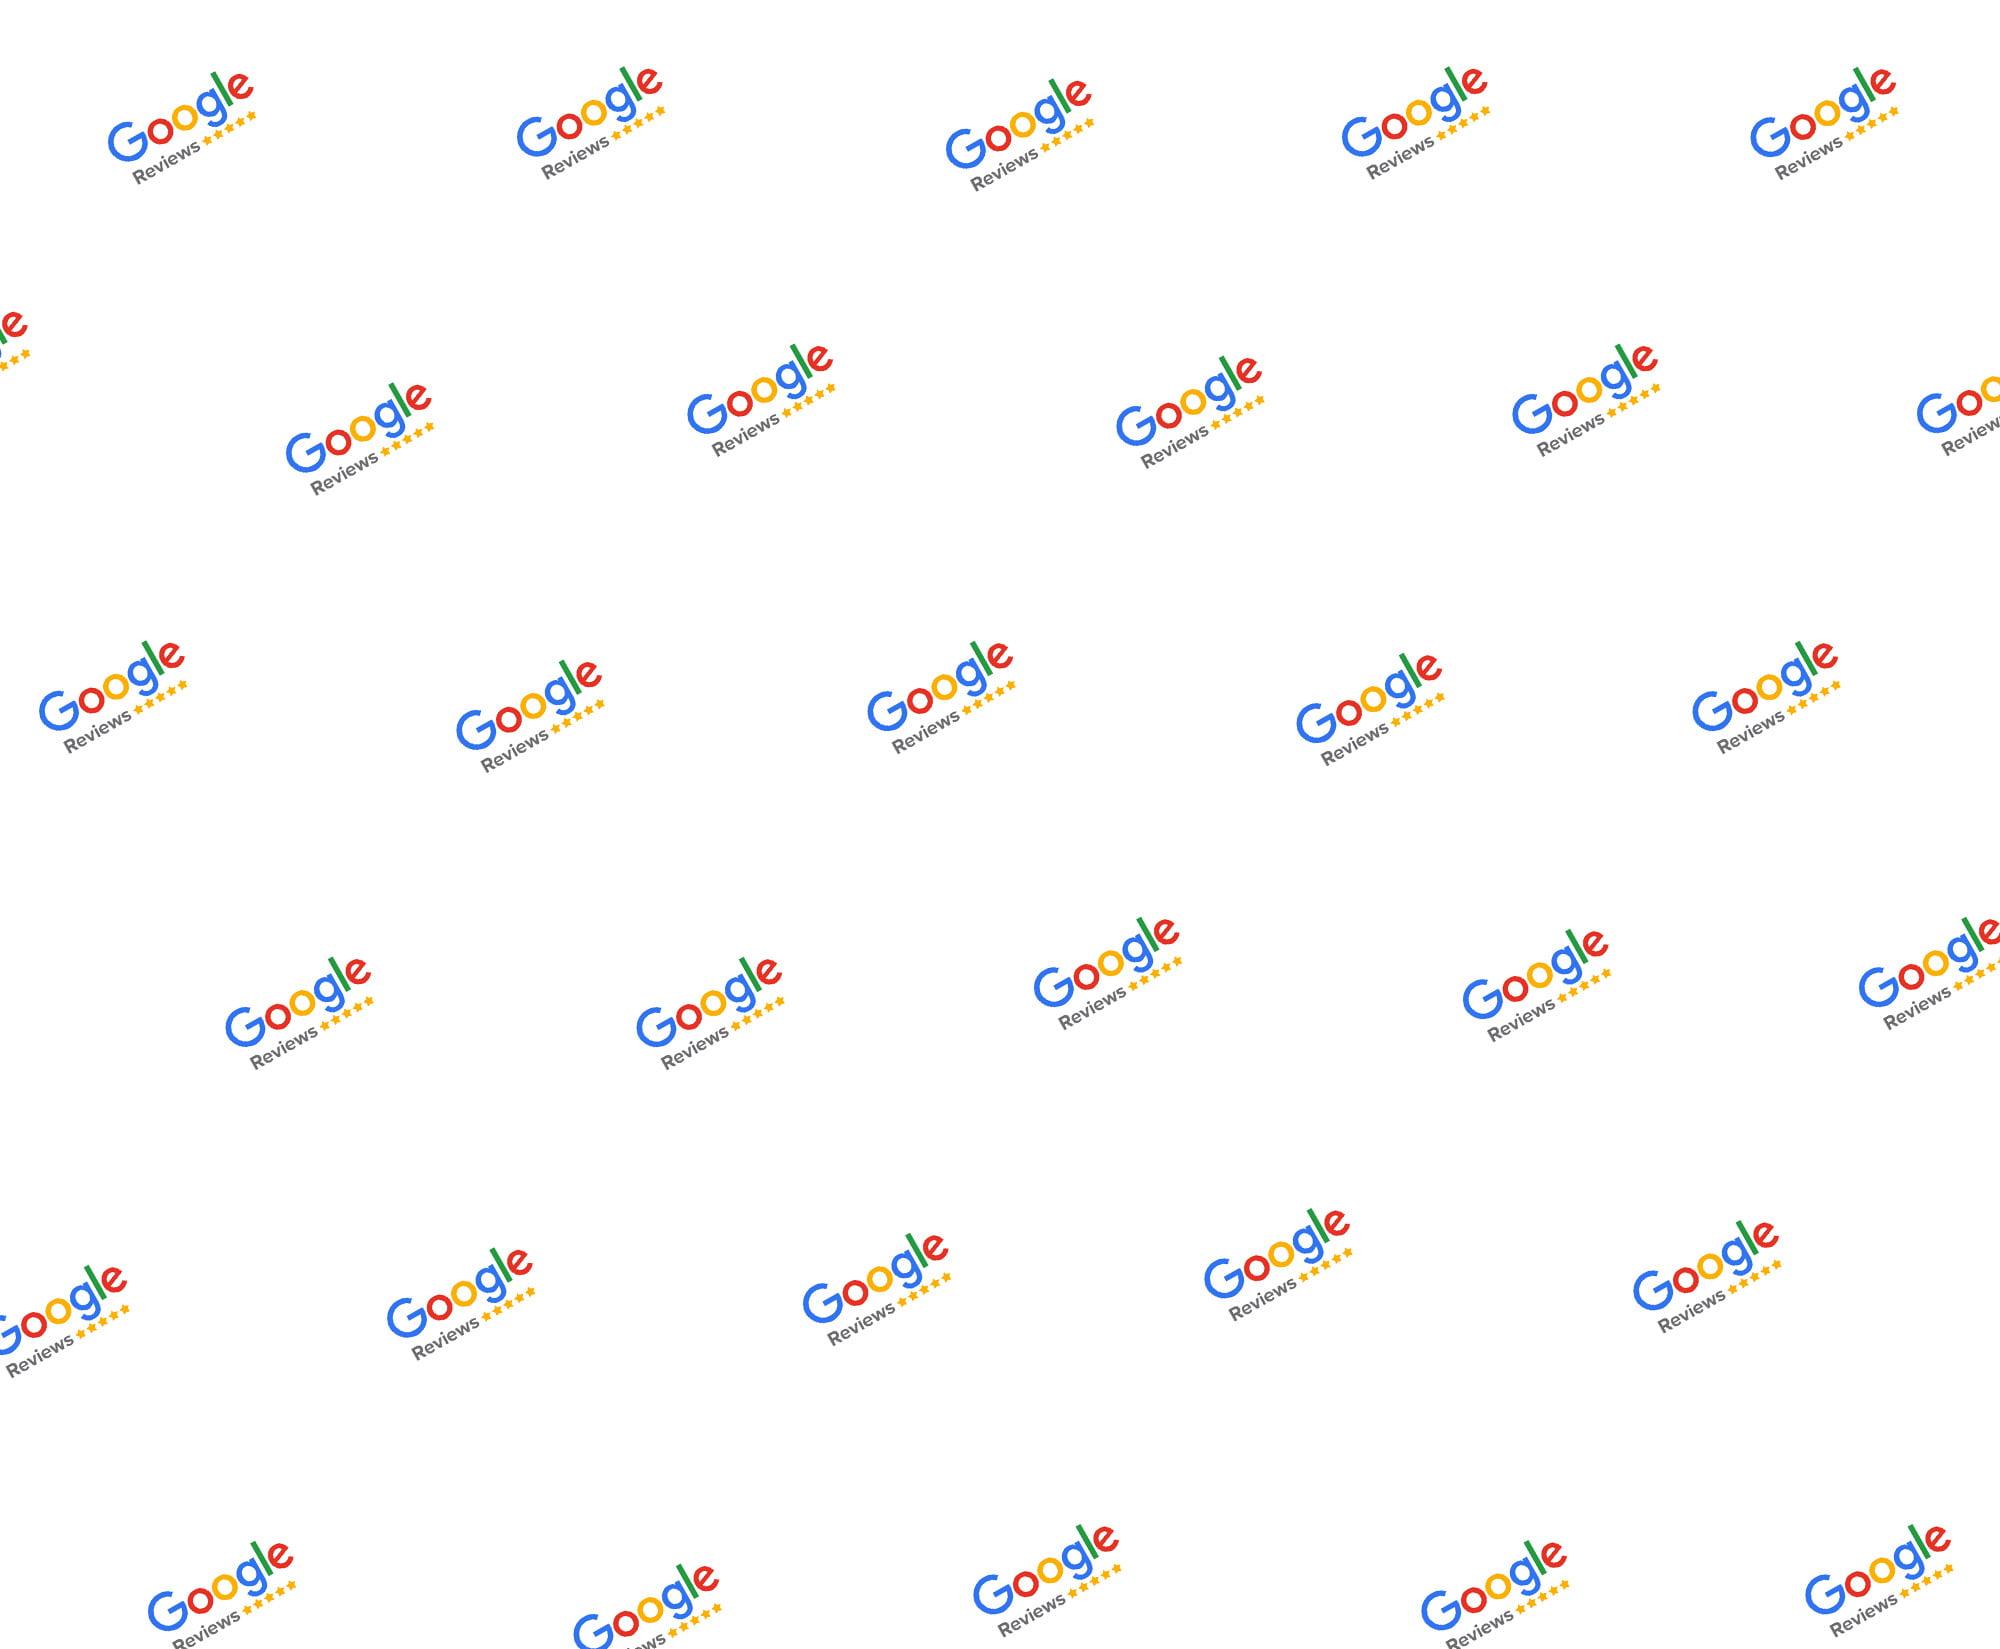 Google Review Integration